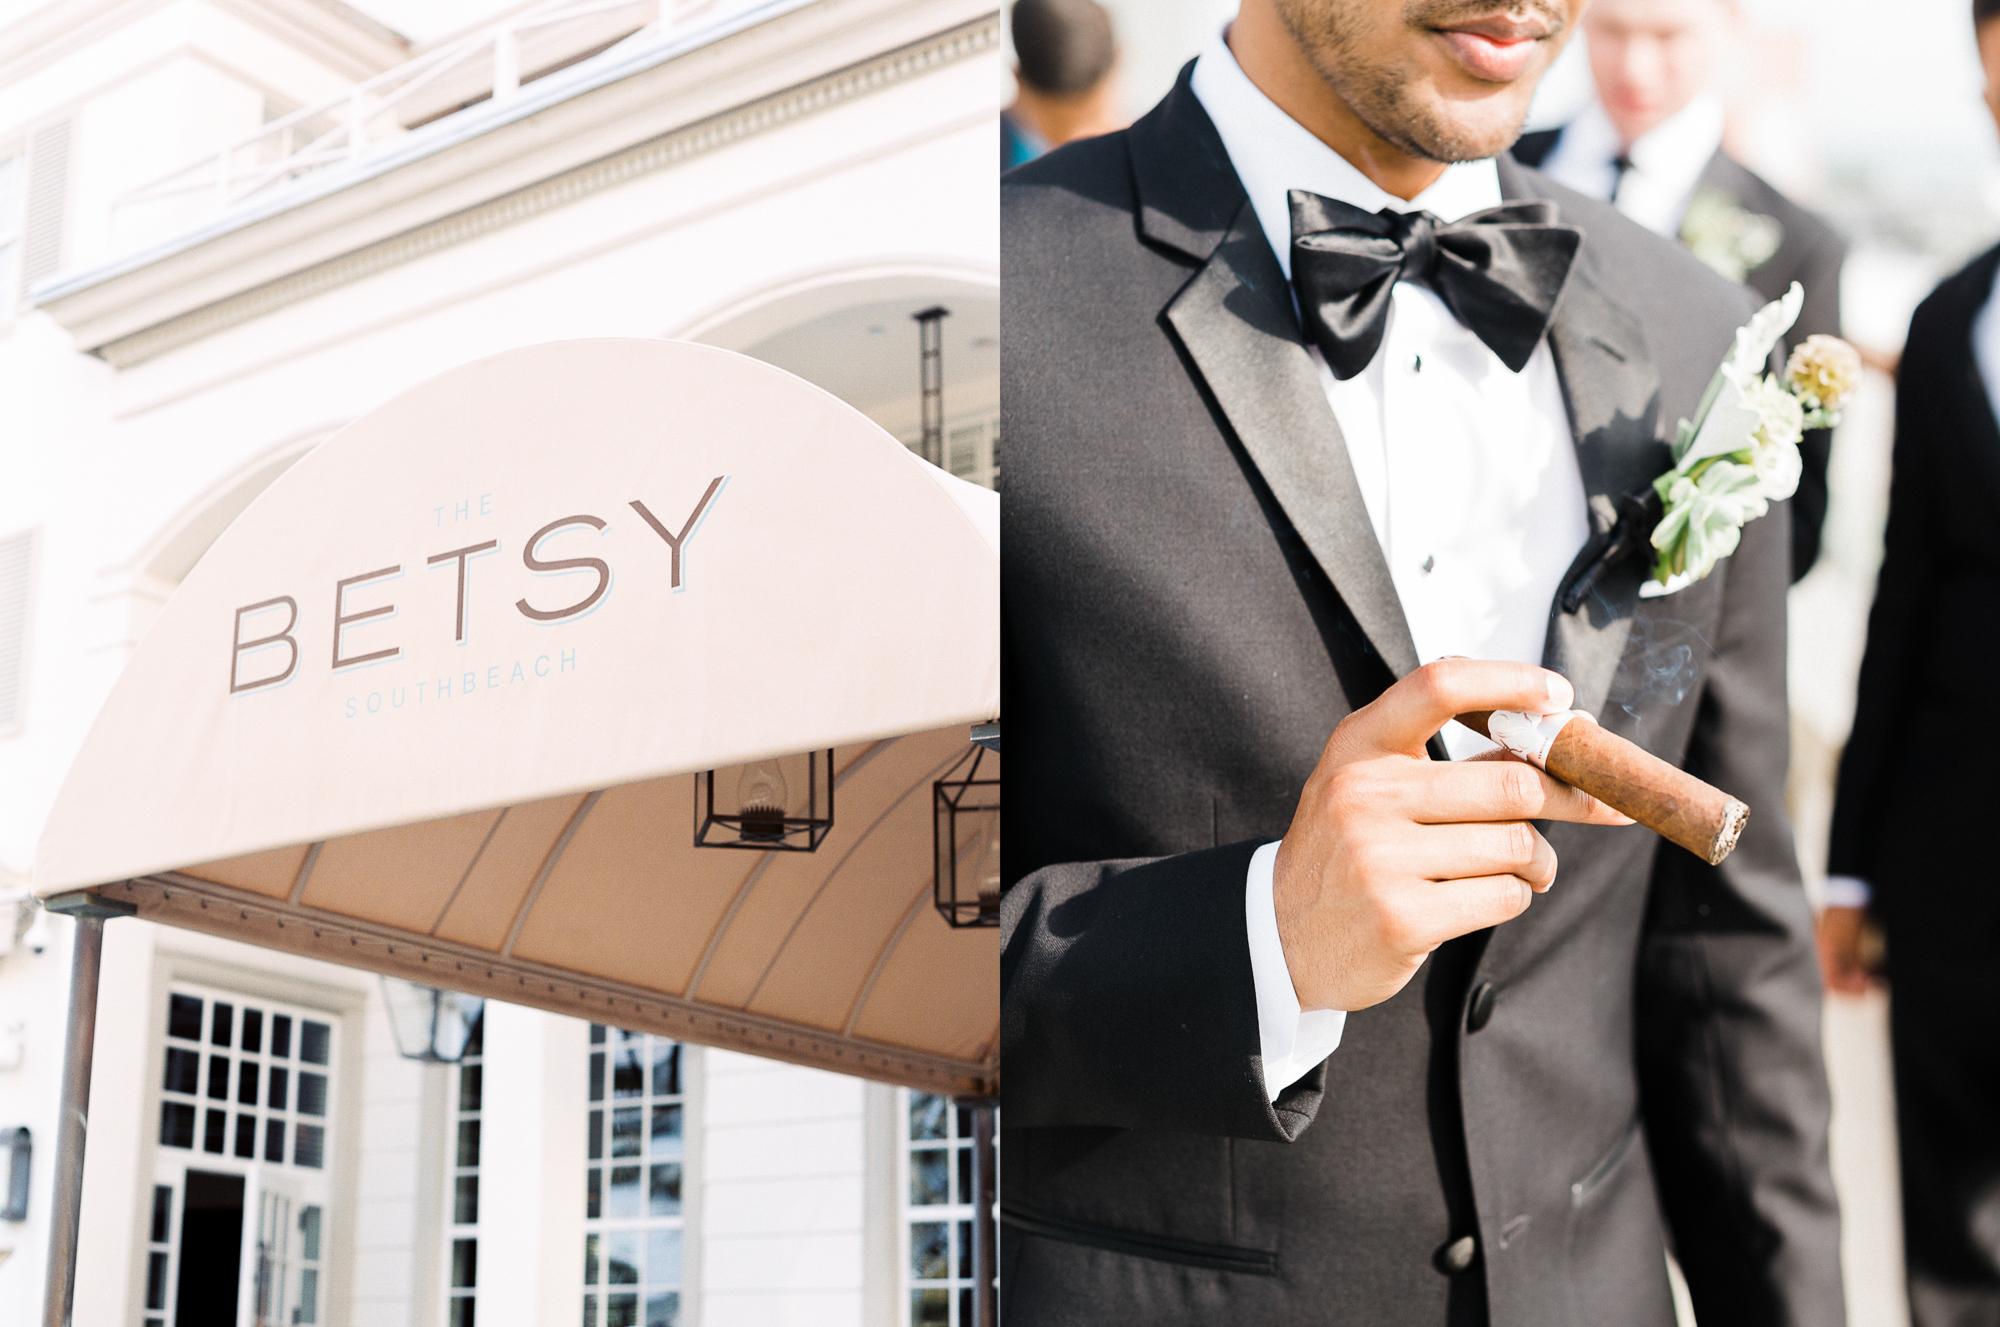 betsy-hotel-wedding-south-beach-miami-charleston-south-carolina-destination-wedding-photographer-6.jpg